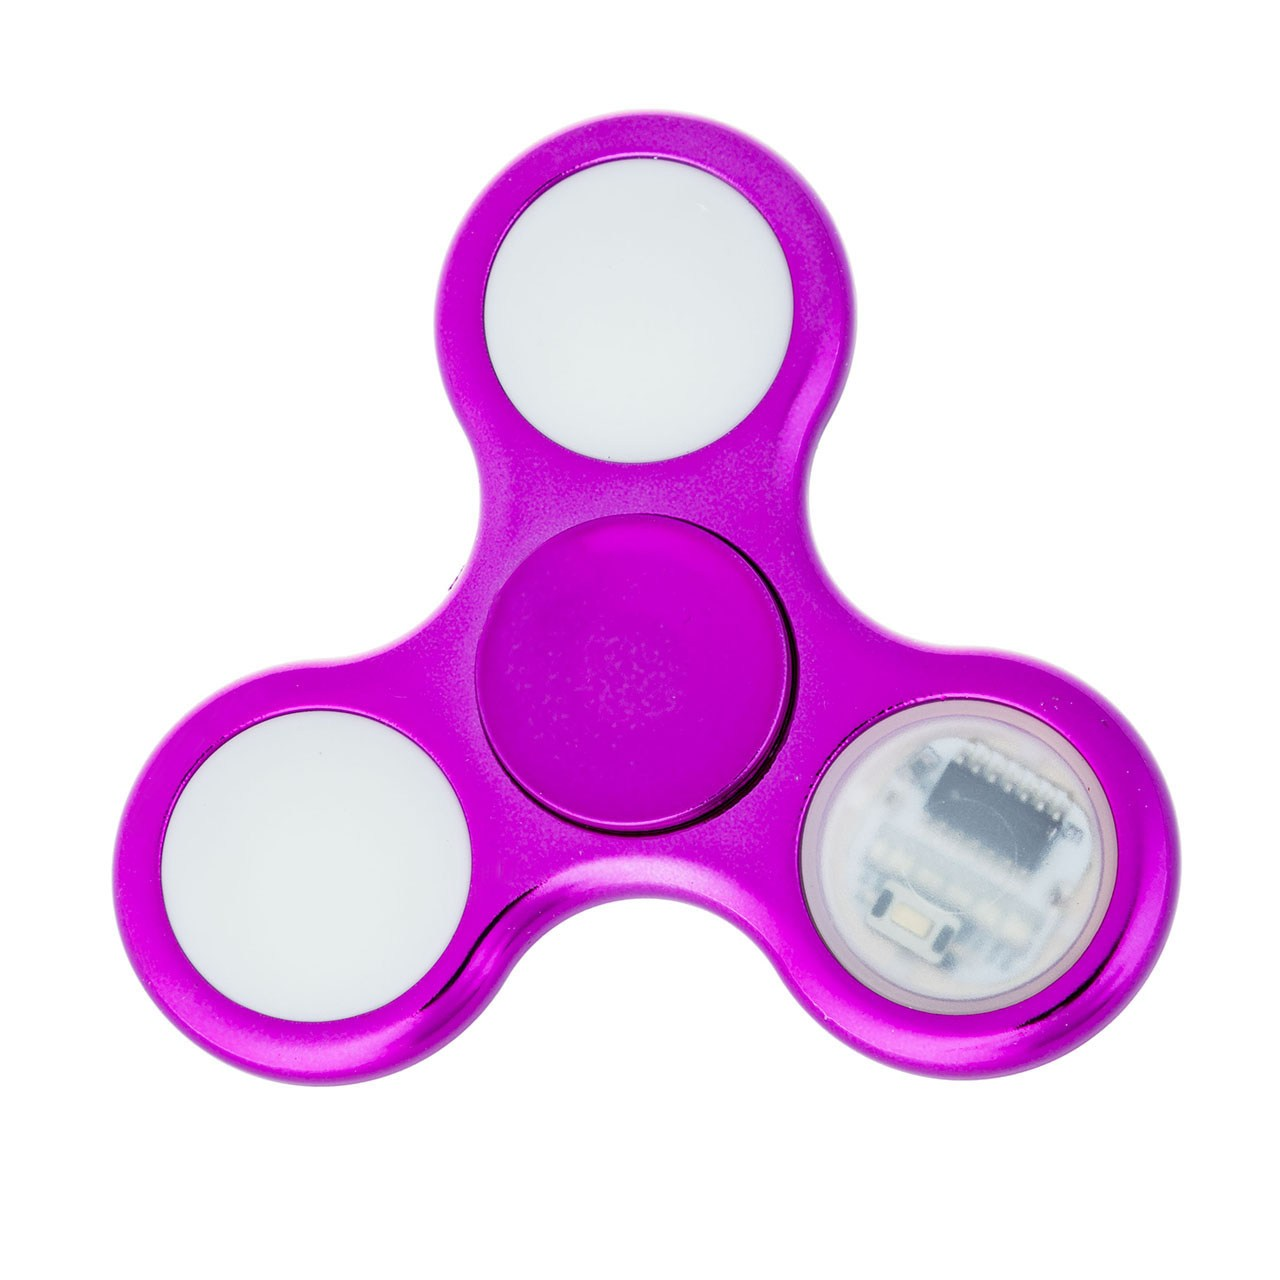 فروش                     اسپینر دستی مدل Illuminated Shapes LED